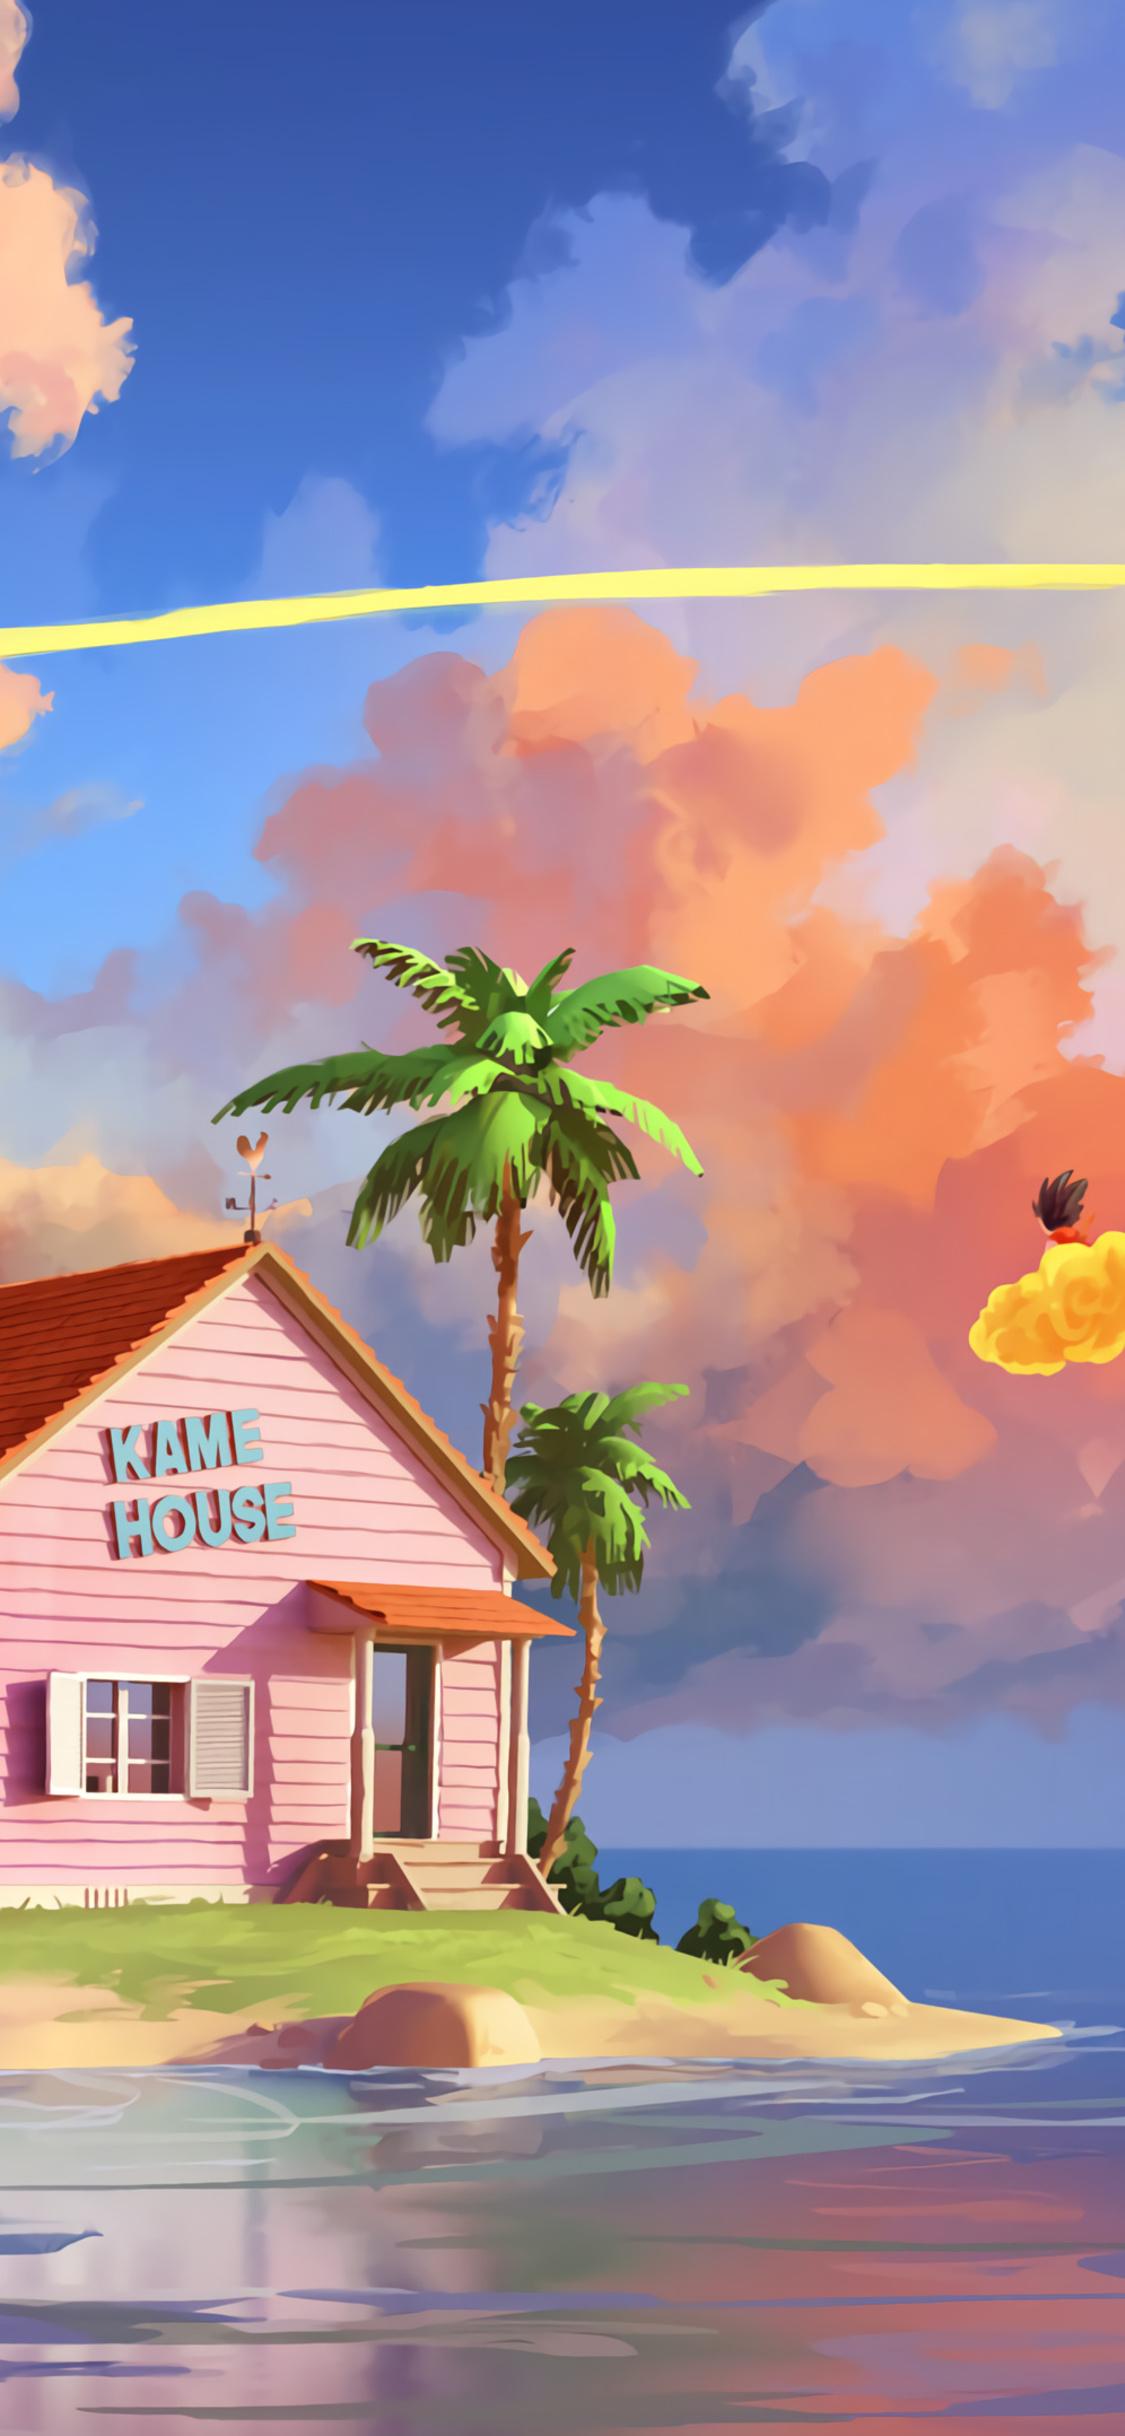 kane-house-dragon-ball-4k-cr.jpg